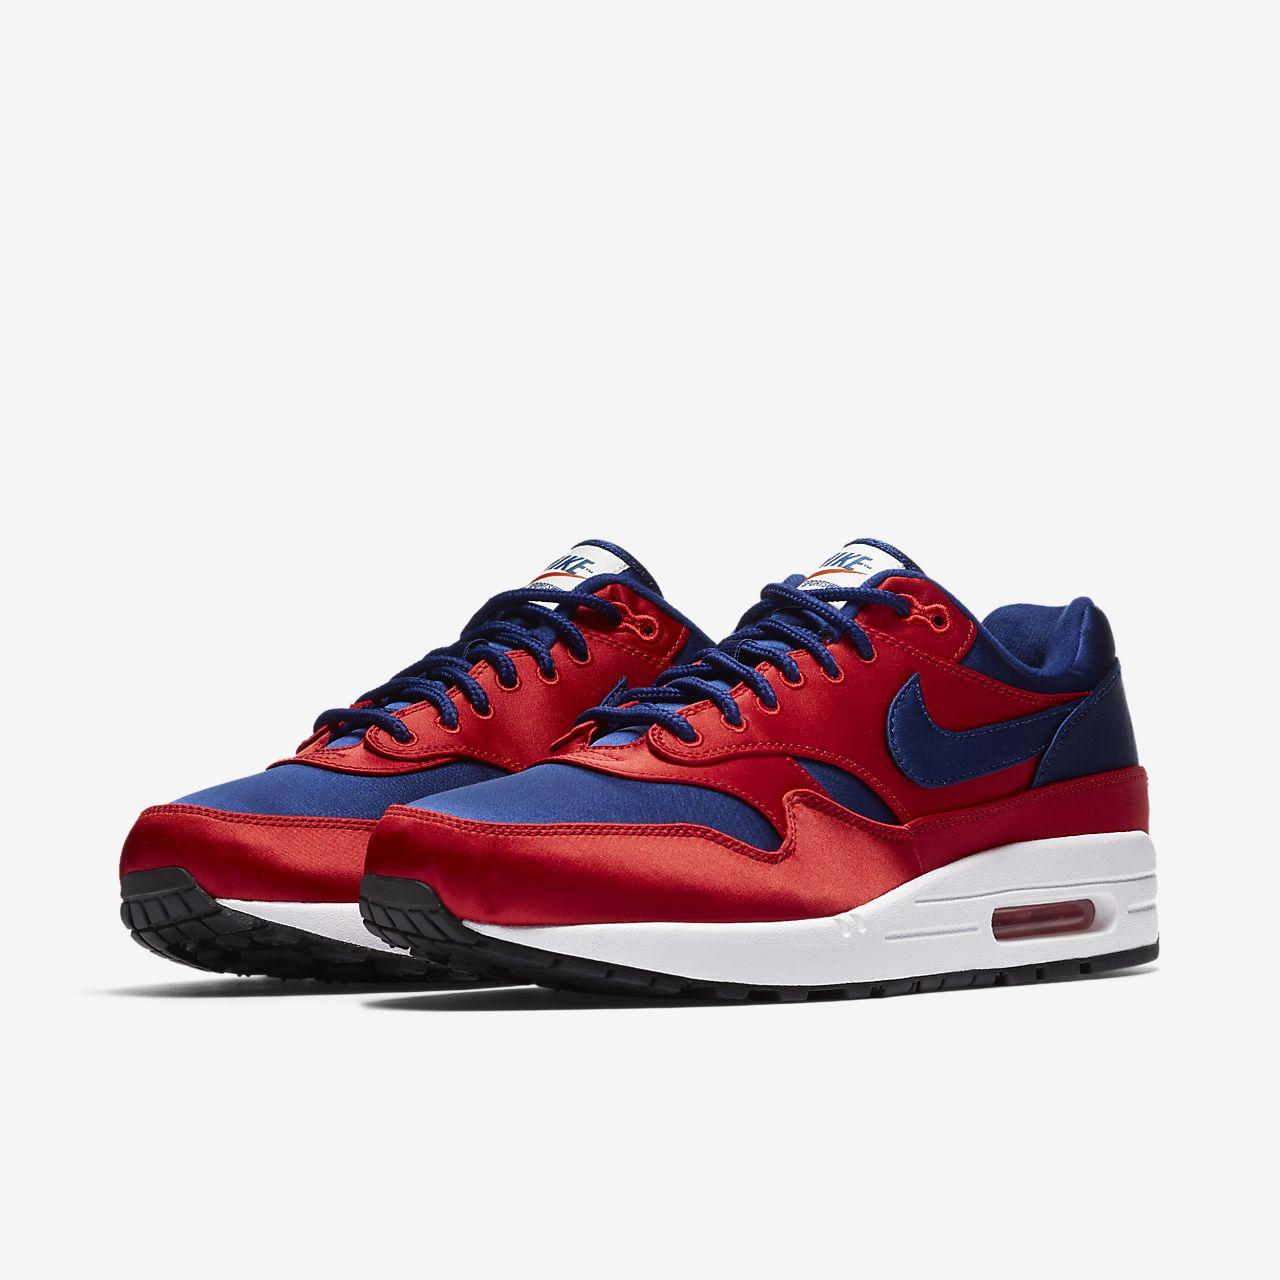 on sale e8619 3492d ... Calzado para hombre Nike Air Max 1 SE